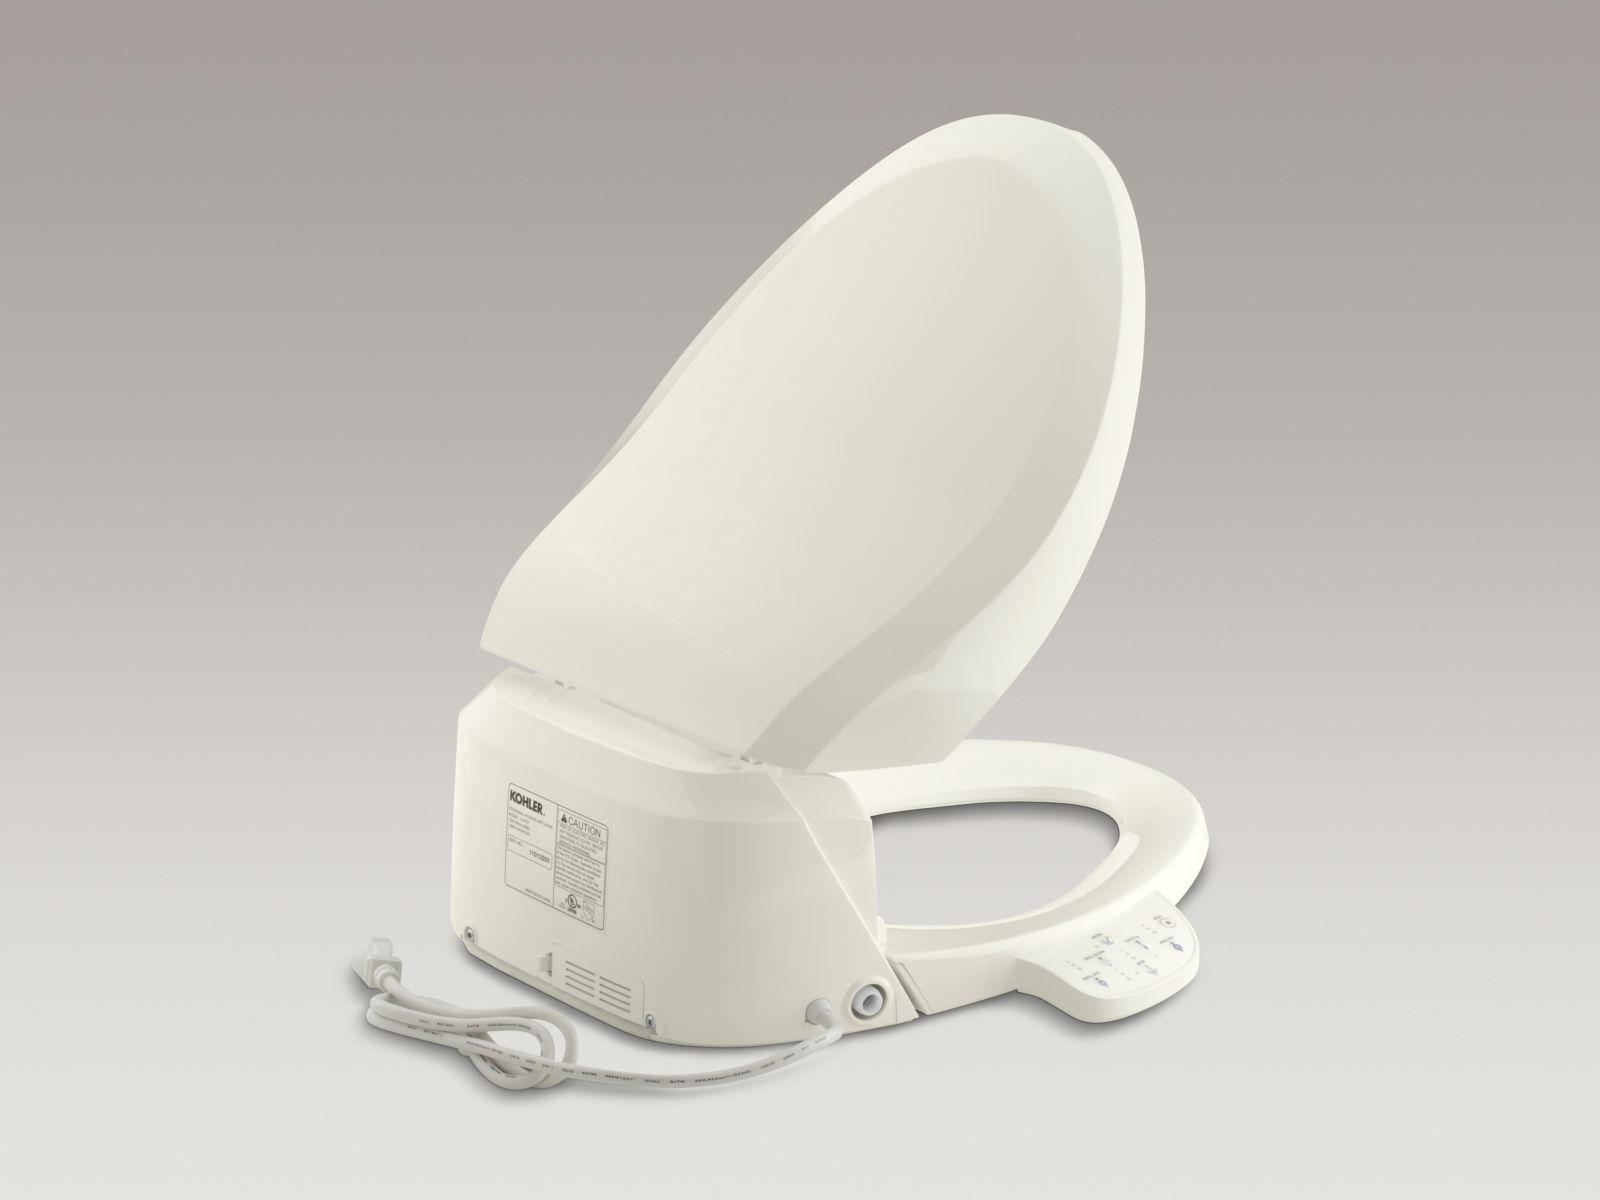 Kohler K-4737-96 C3-125 Elongated Bowl Toilet Seat with Bidet Functionality Biscuit